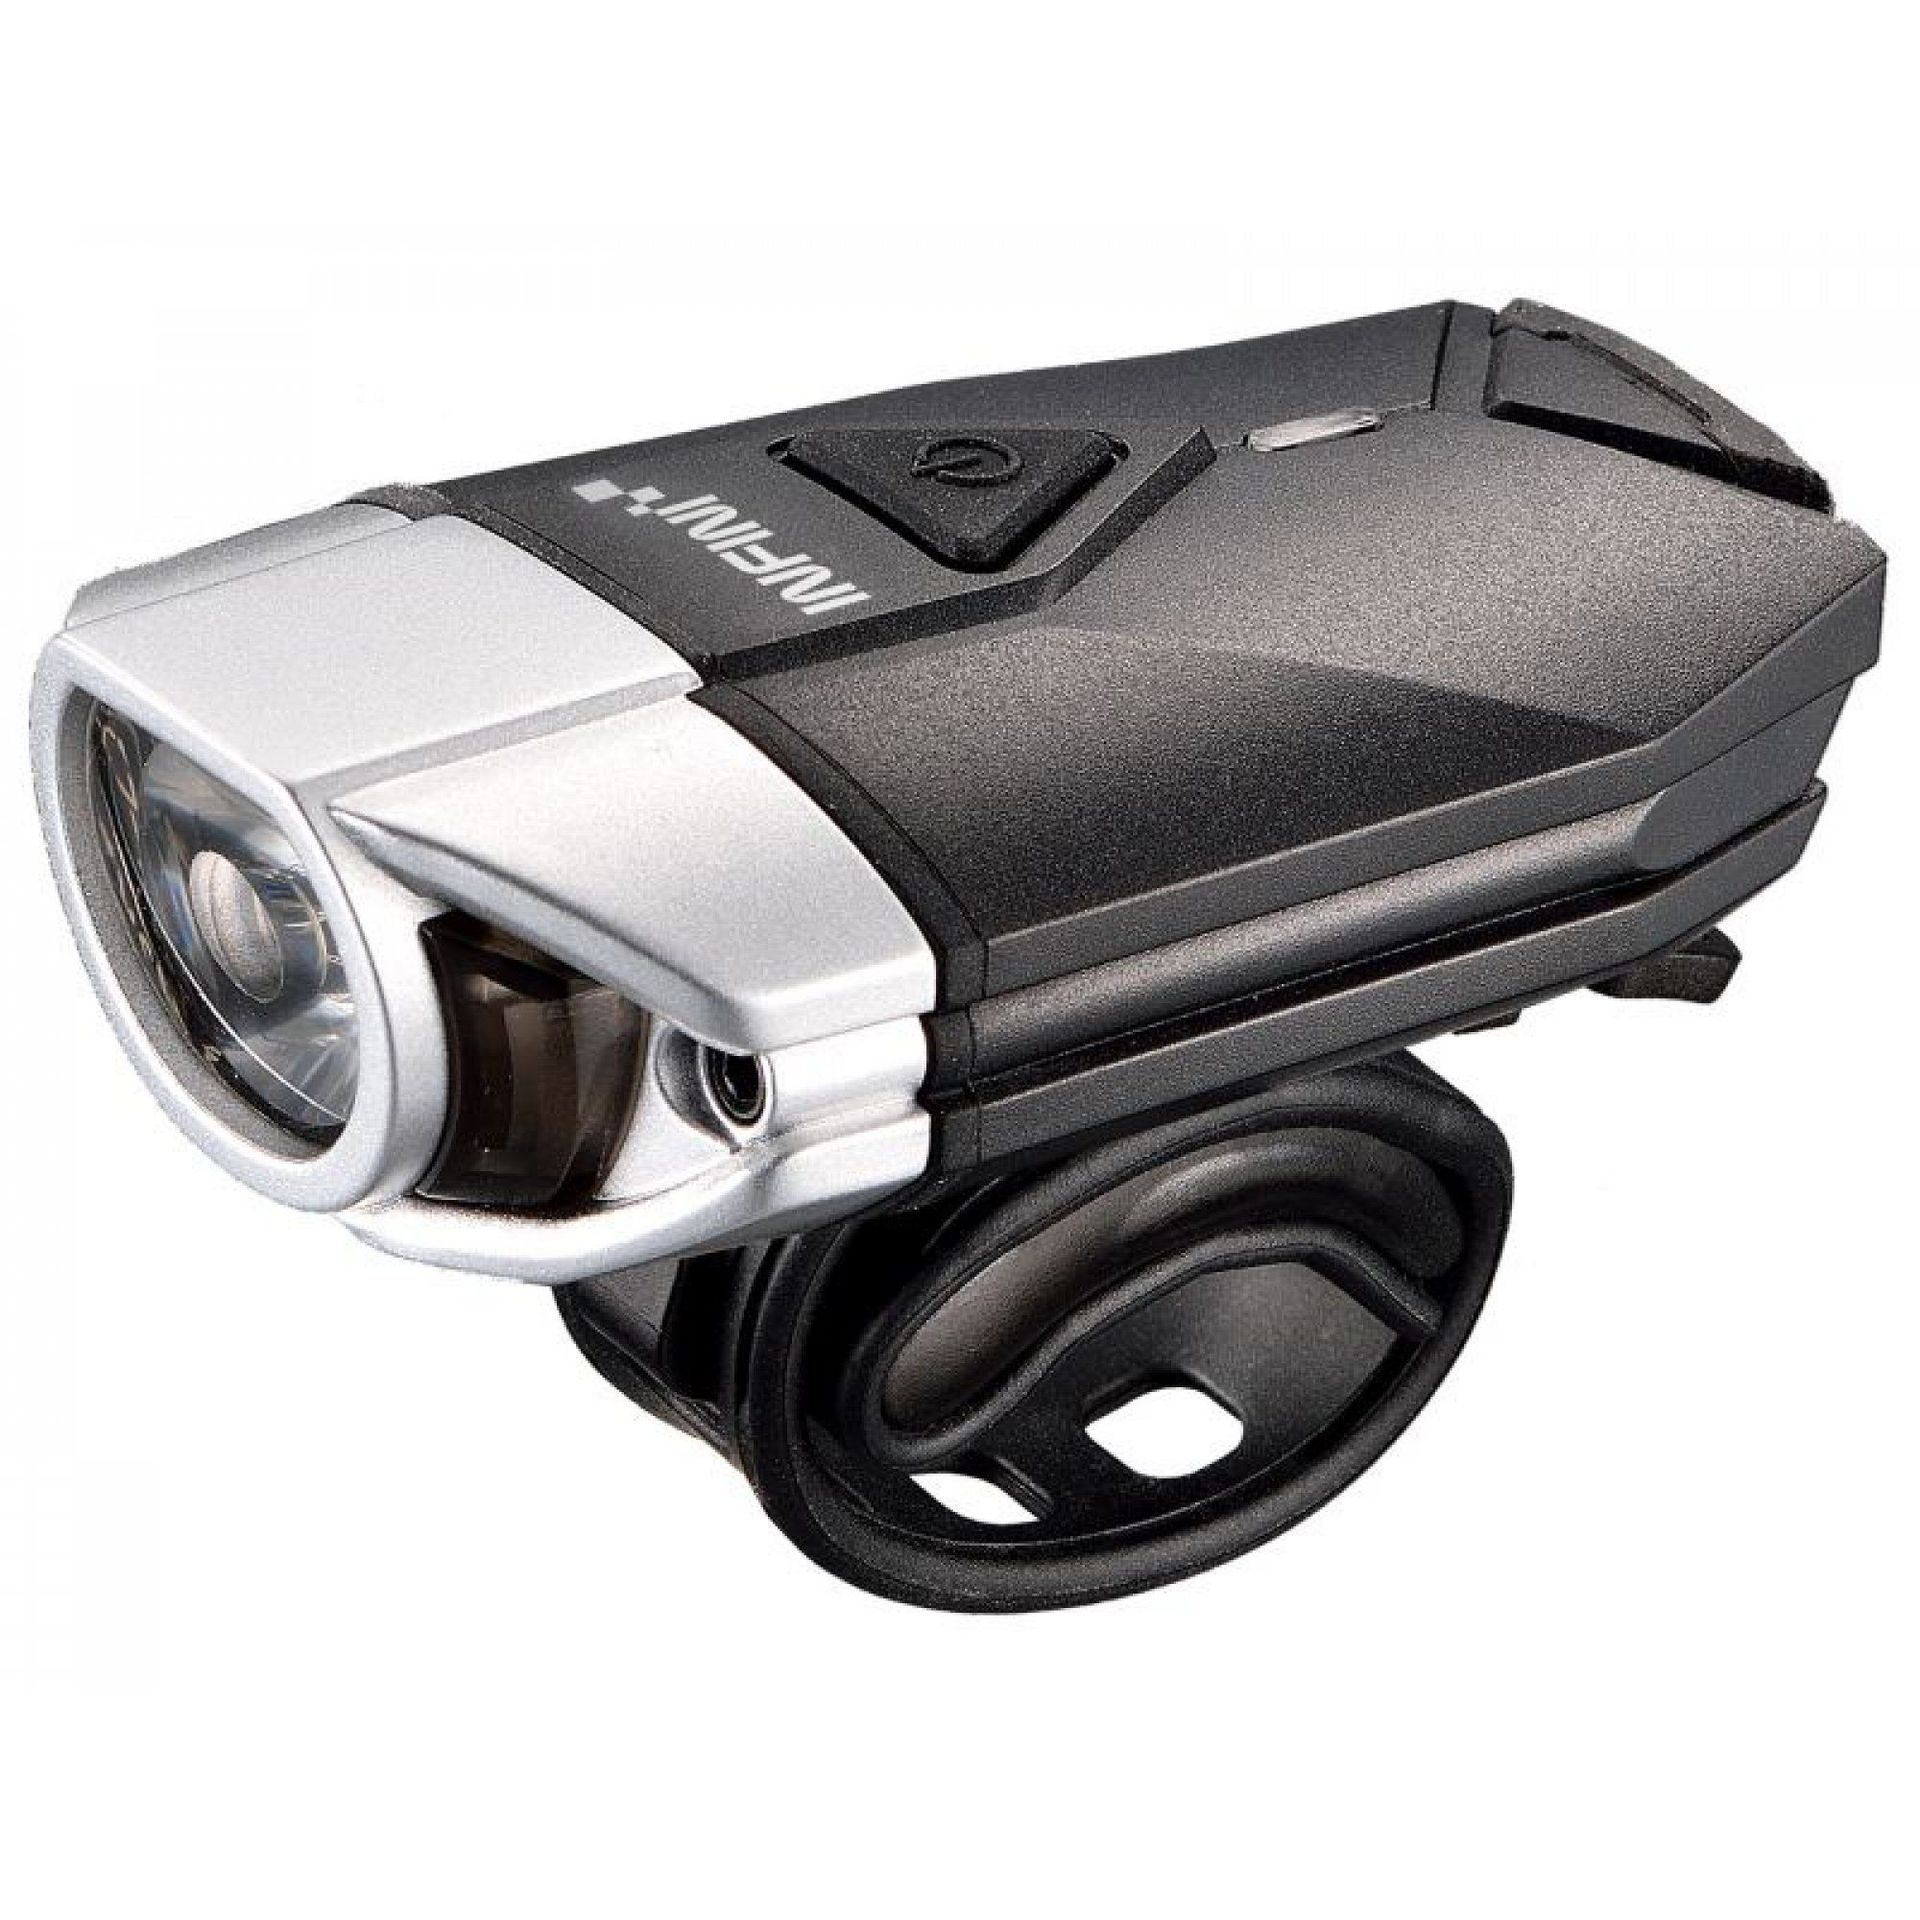 LAMPKA ROWEROWA PRZEDNIA INFINI SUPER LAVA USB  CZARNY|SREBRNY 1